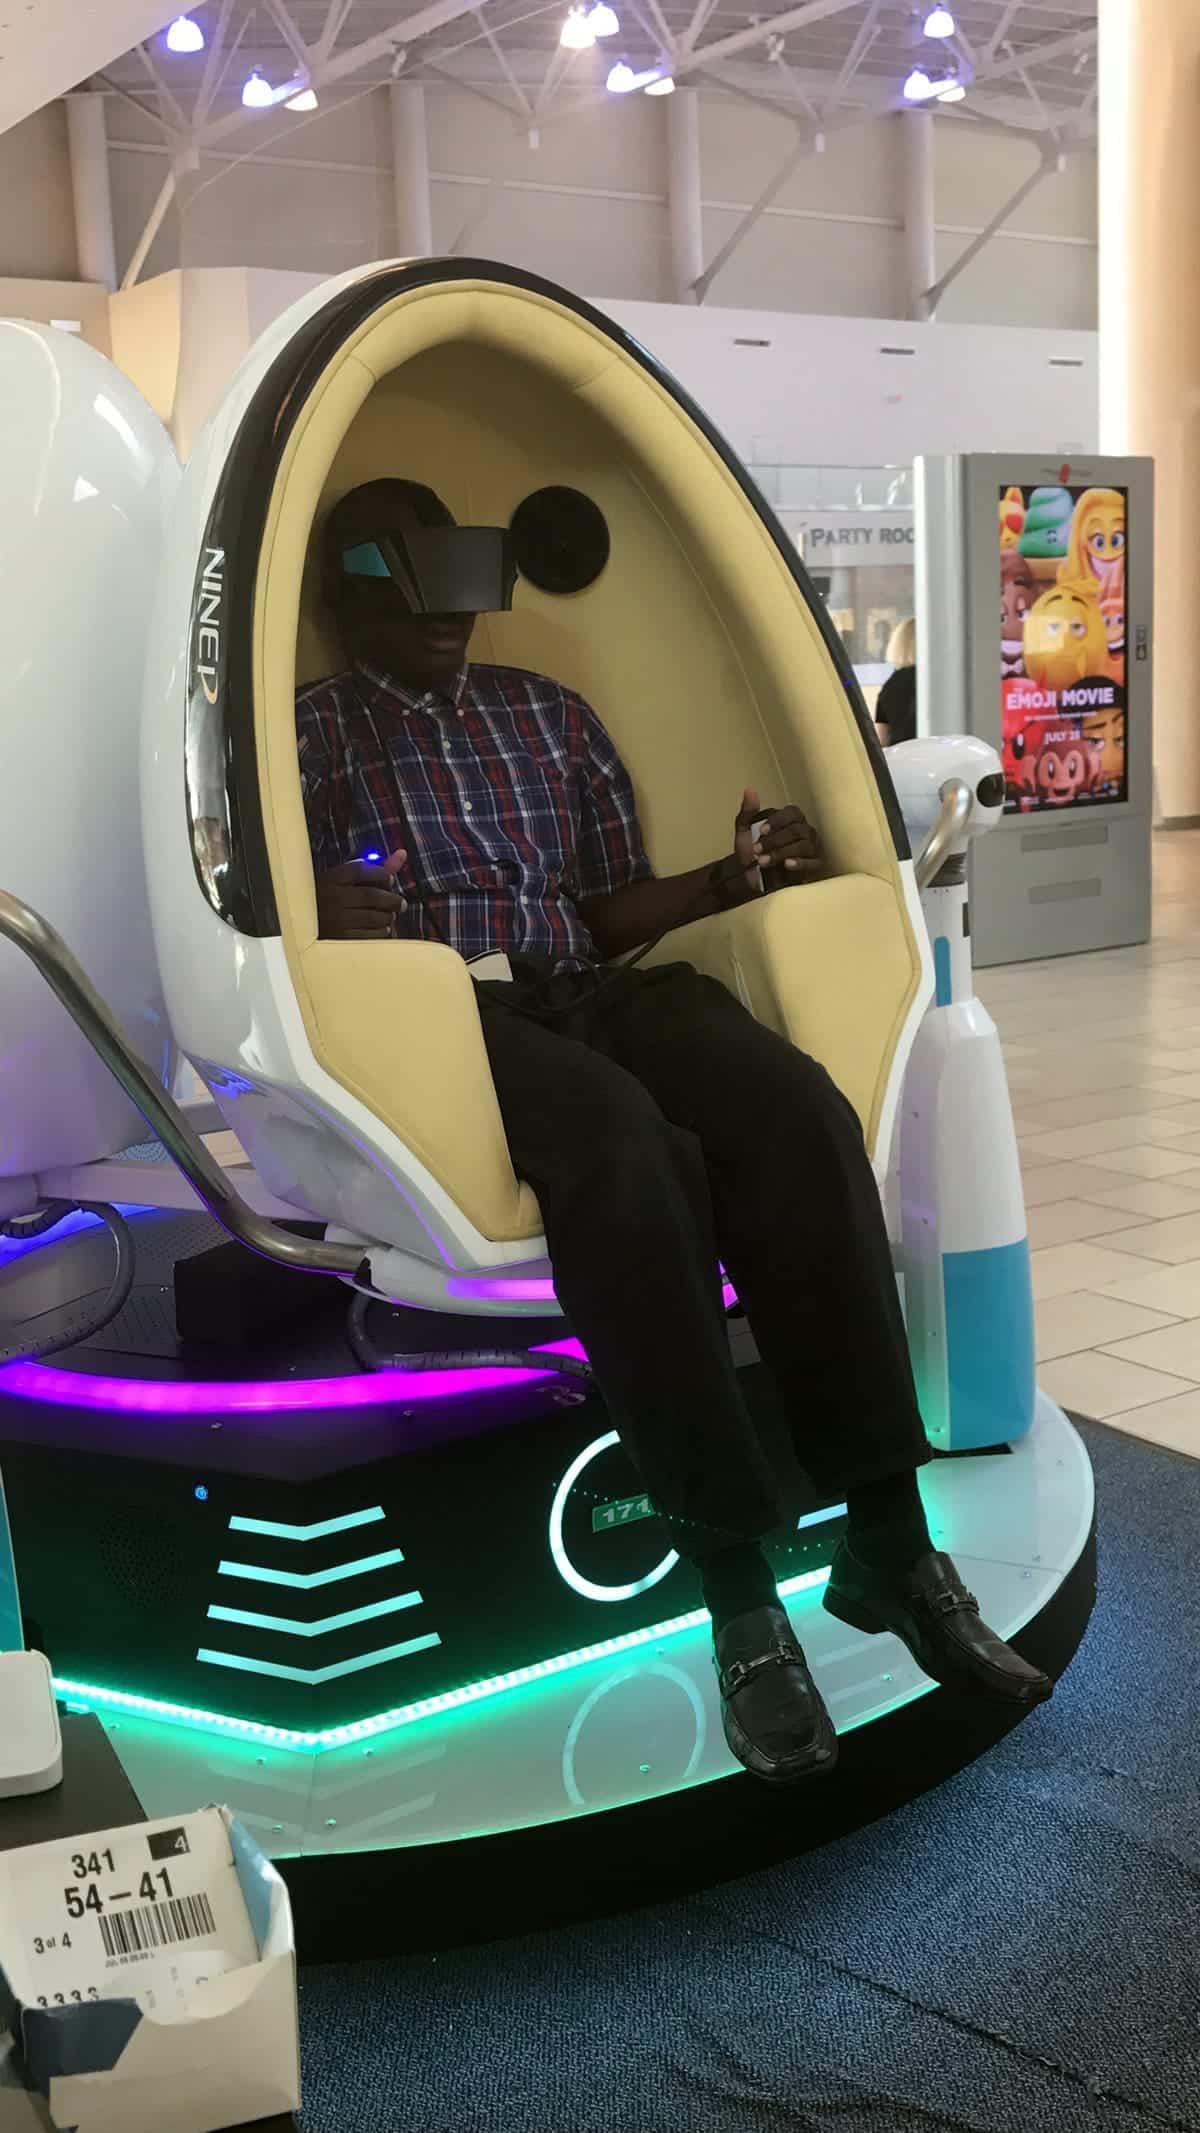 A photo of a man sitting in a VR simulator.